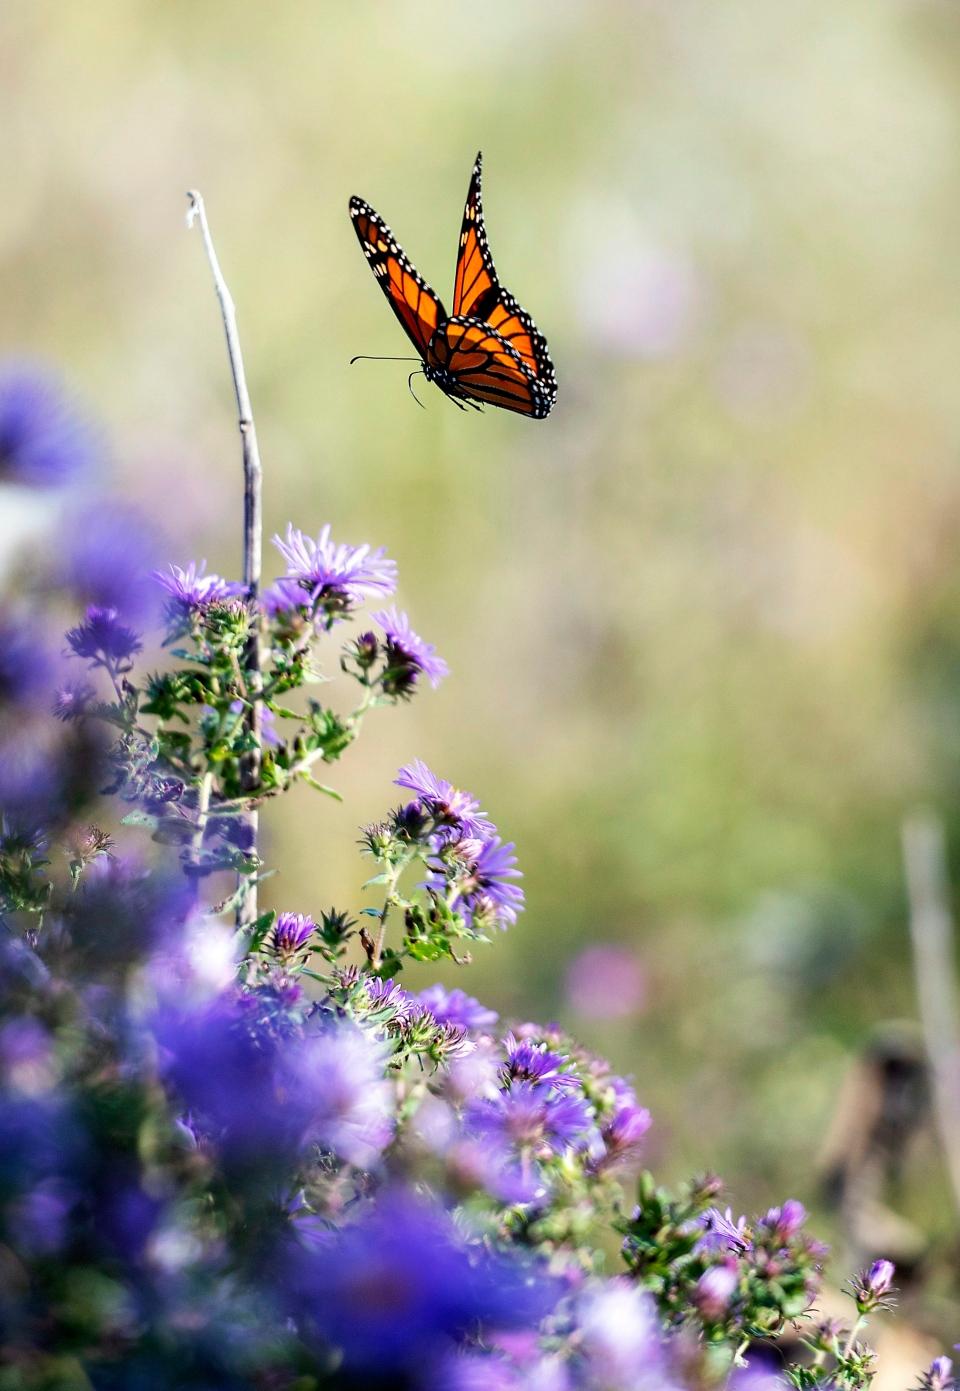 A monarch butterfly flutters around a field behind Dave Bendlin's home Wednesday, Sept. 26, 2018, in Milton, Wis. (Angela Major /The Janesville Gazette via AP)